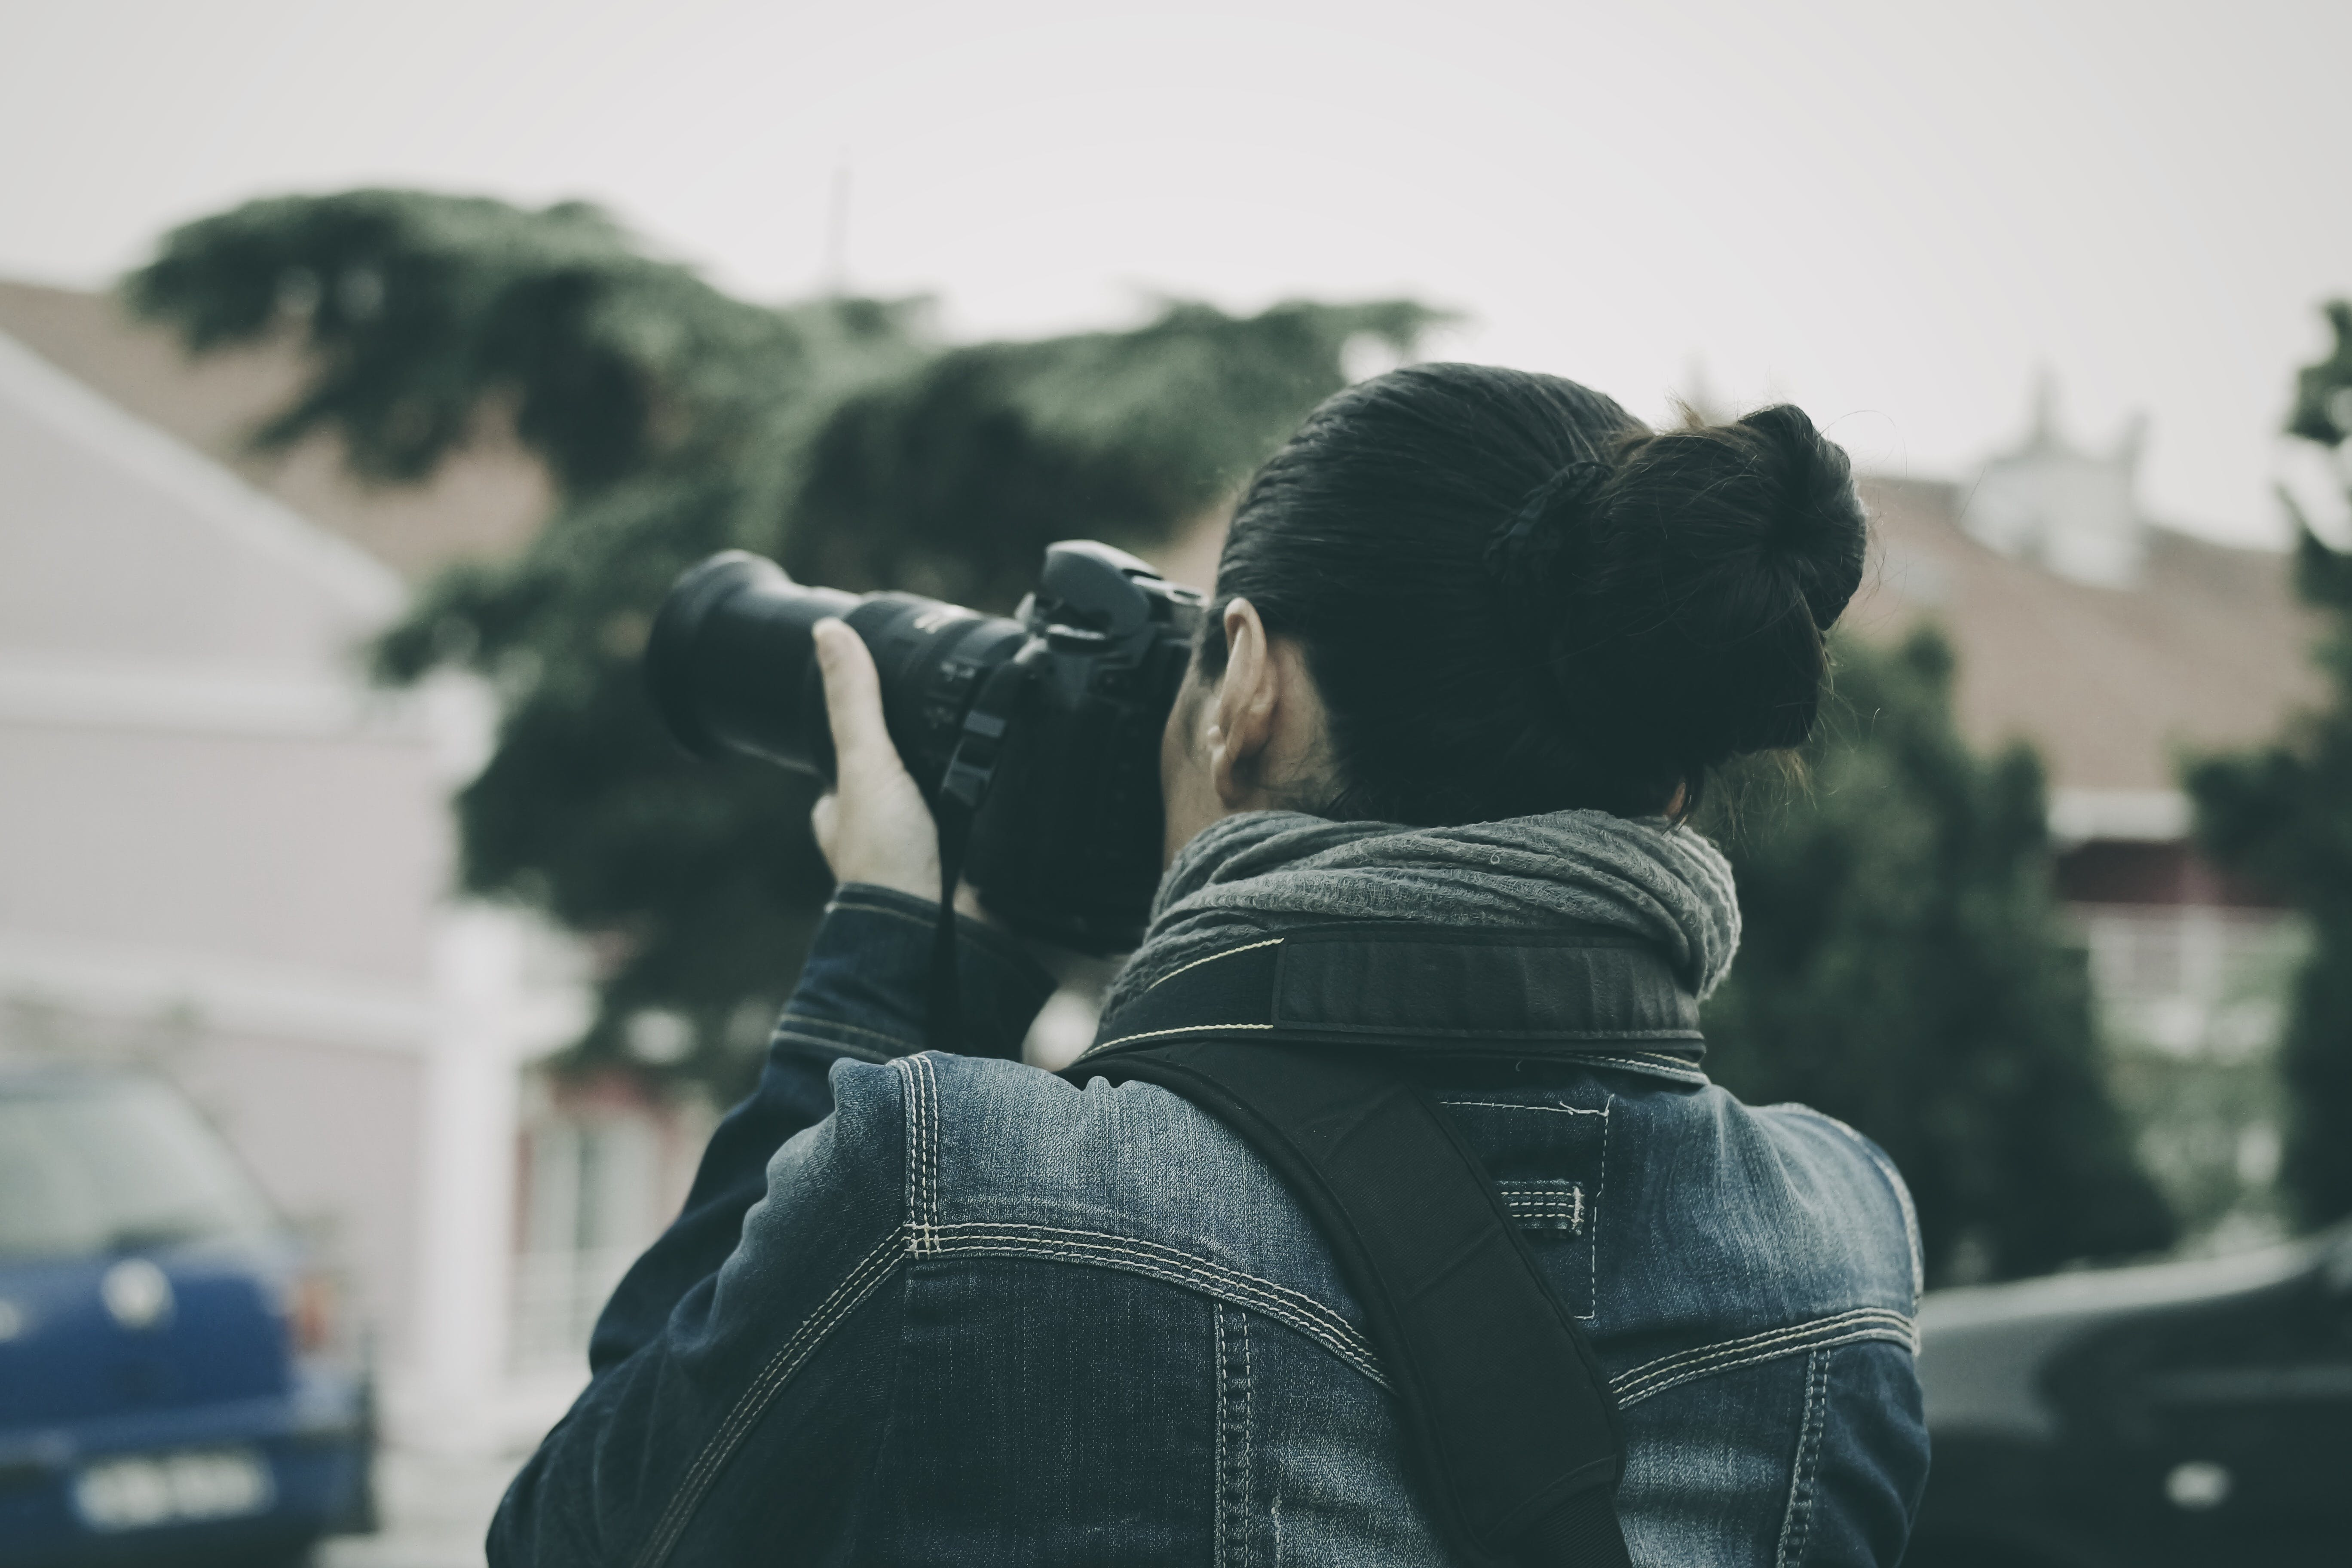 Kostenloses Stock Foto zu fotograf, fotografie, frau, kamera